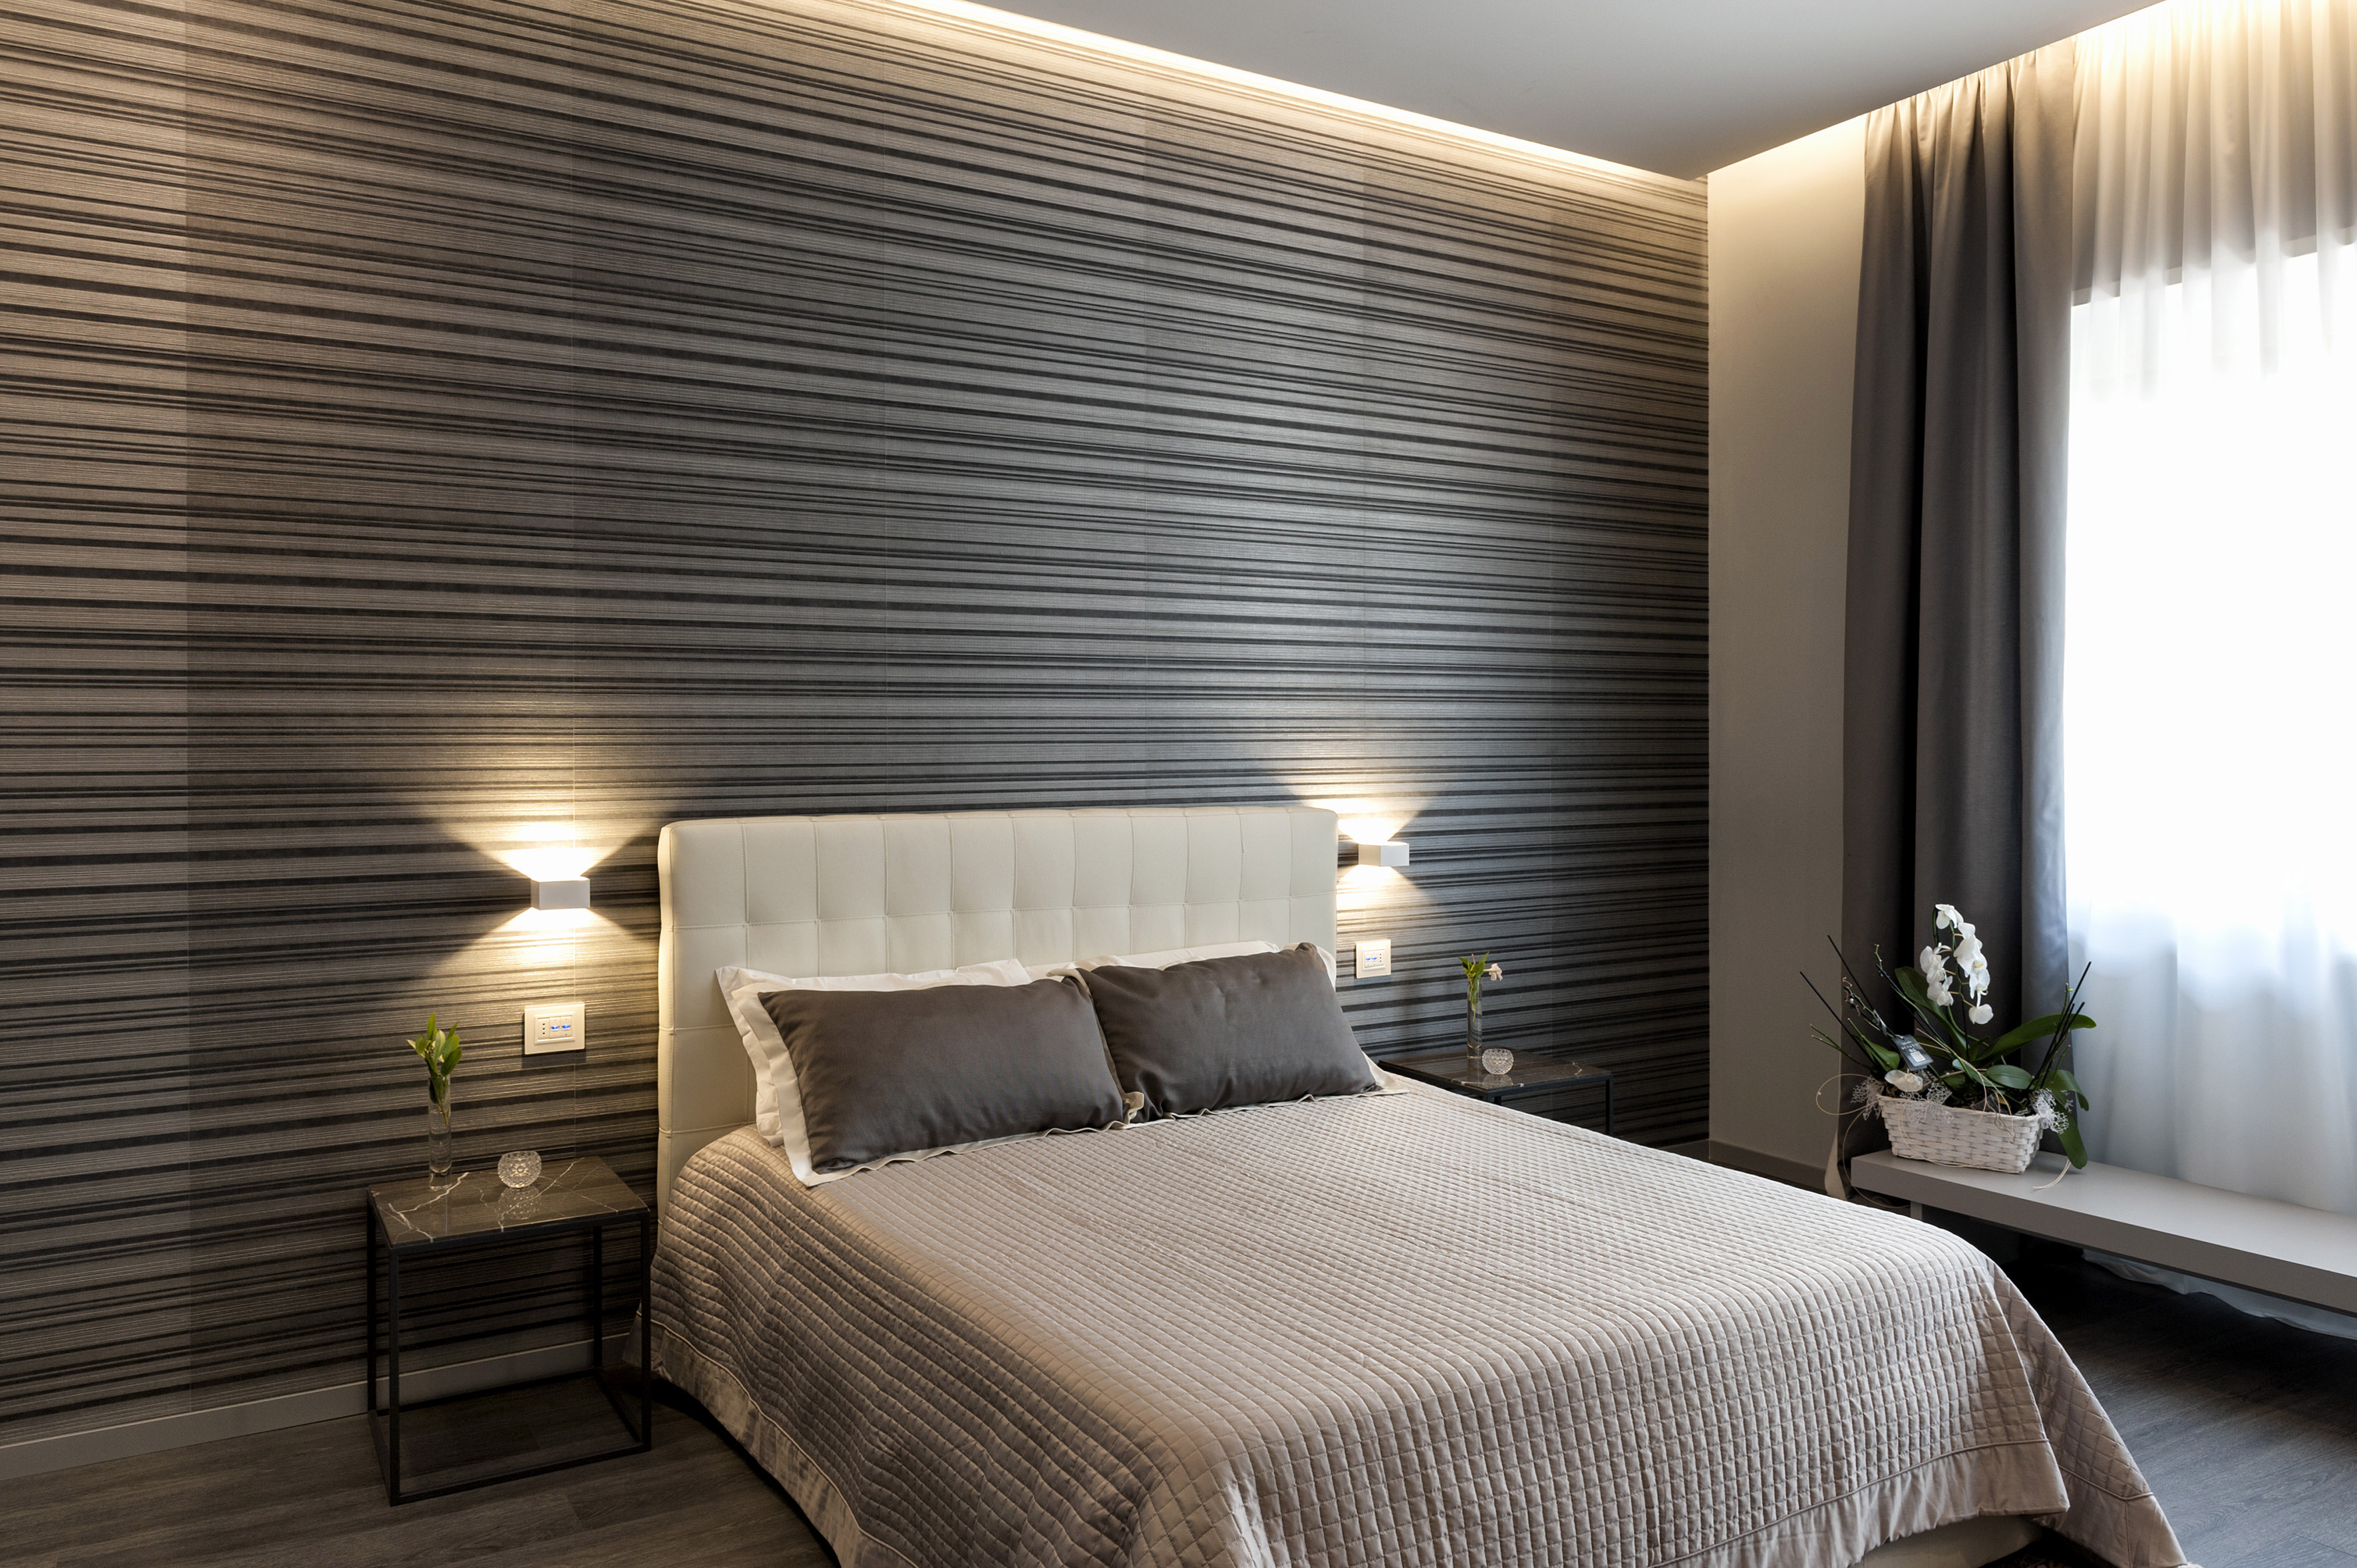 Borea Luxury B&B – Pescara